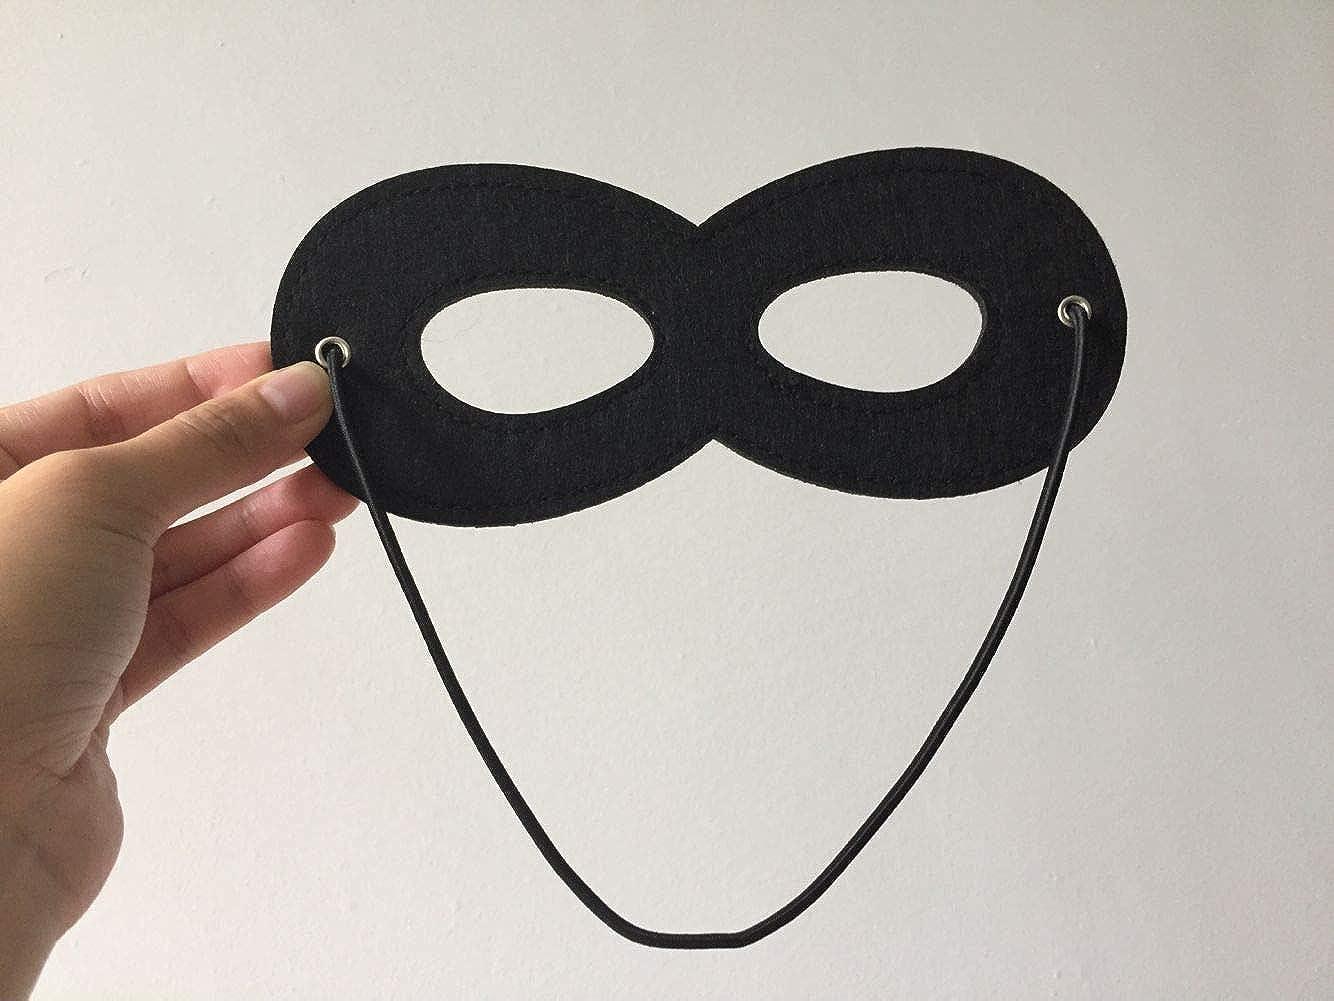 LOVINSHOW 6pcs Black Superhero Masks Halloween Cosplay Masks Half Masks Felt Eye Masks with Elastic Rope for Kids Party